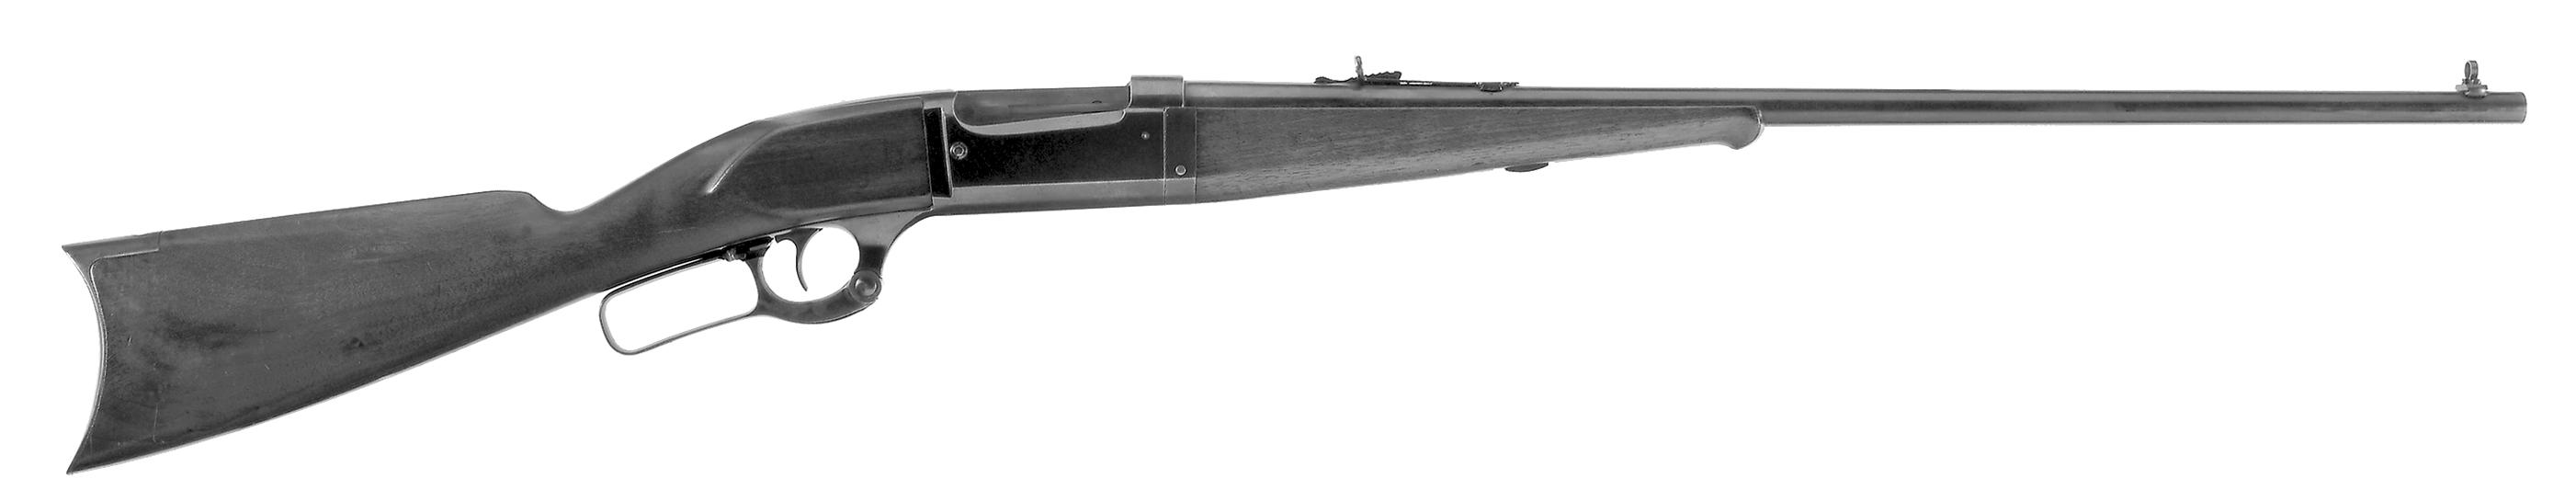 Model 1899-A 26